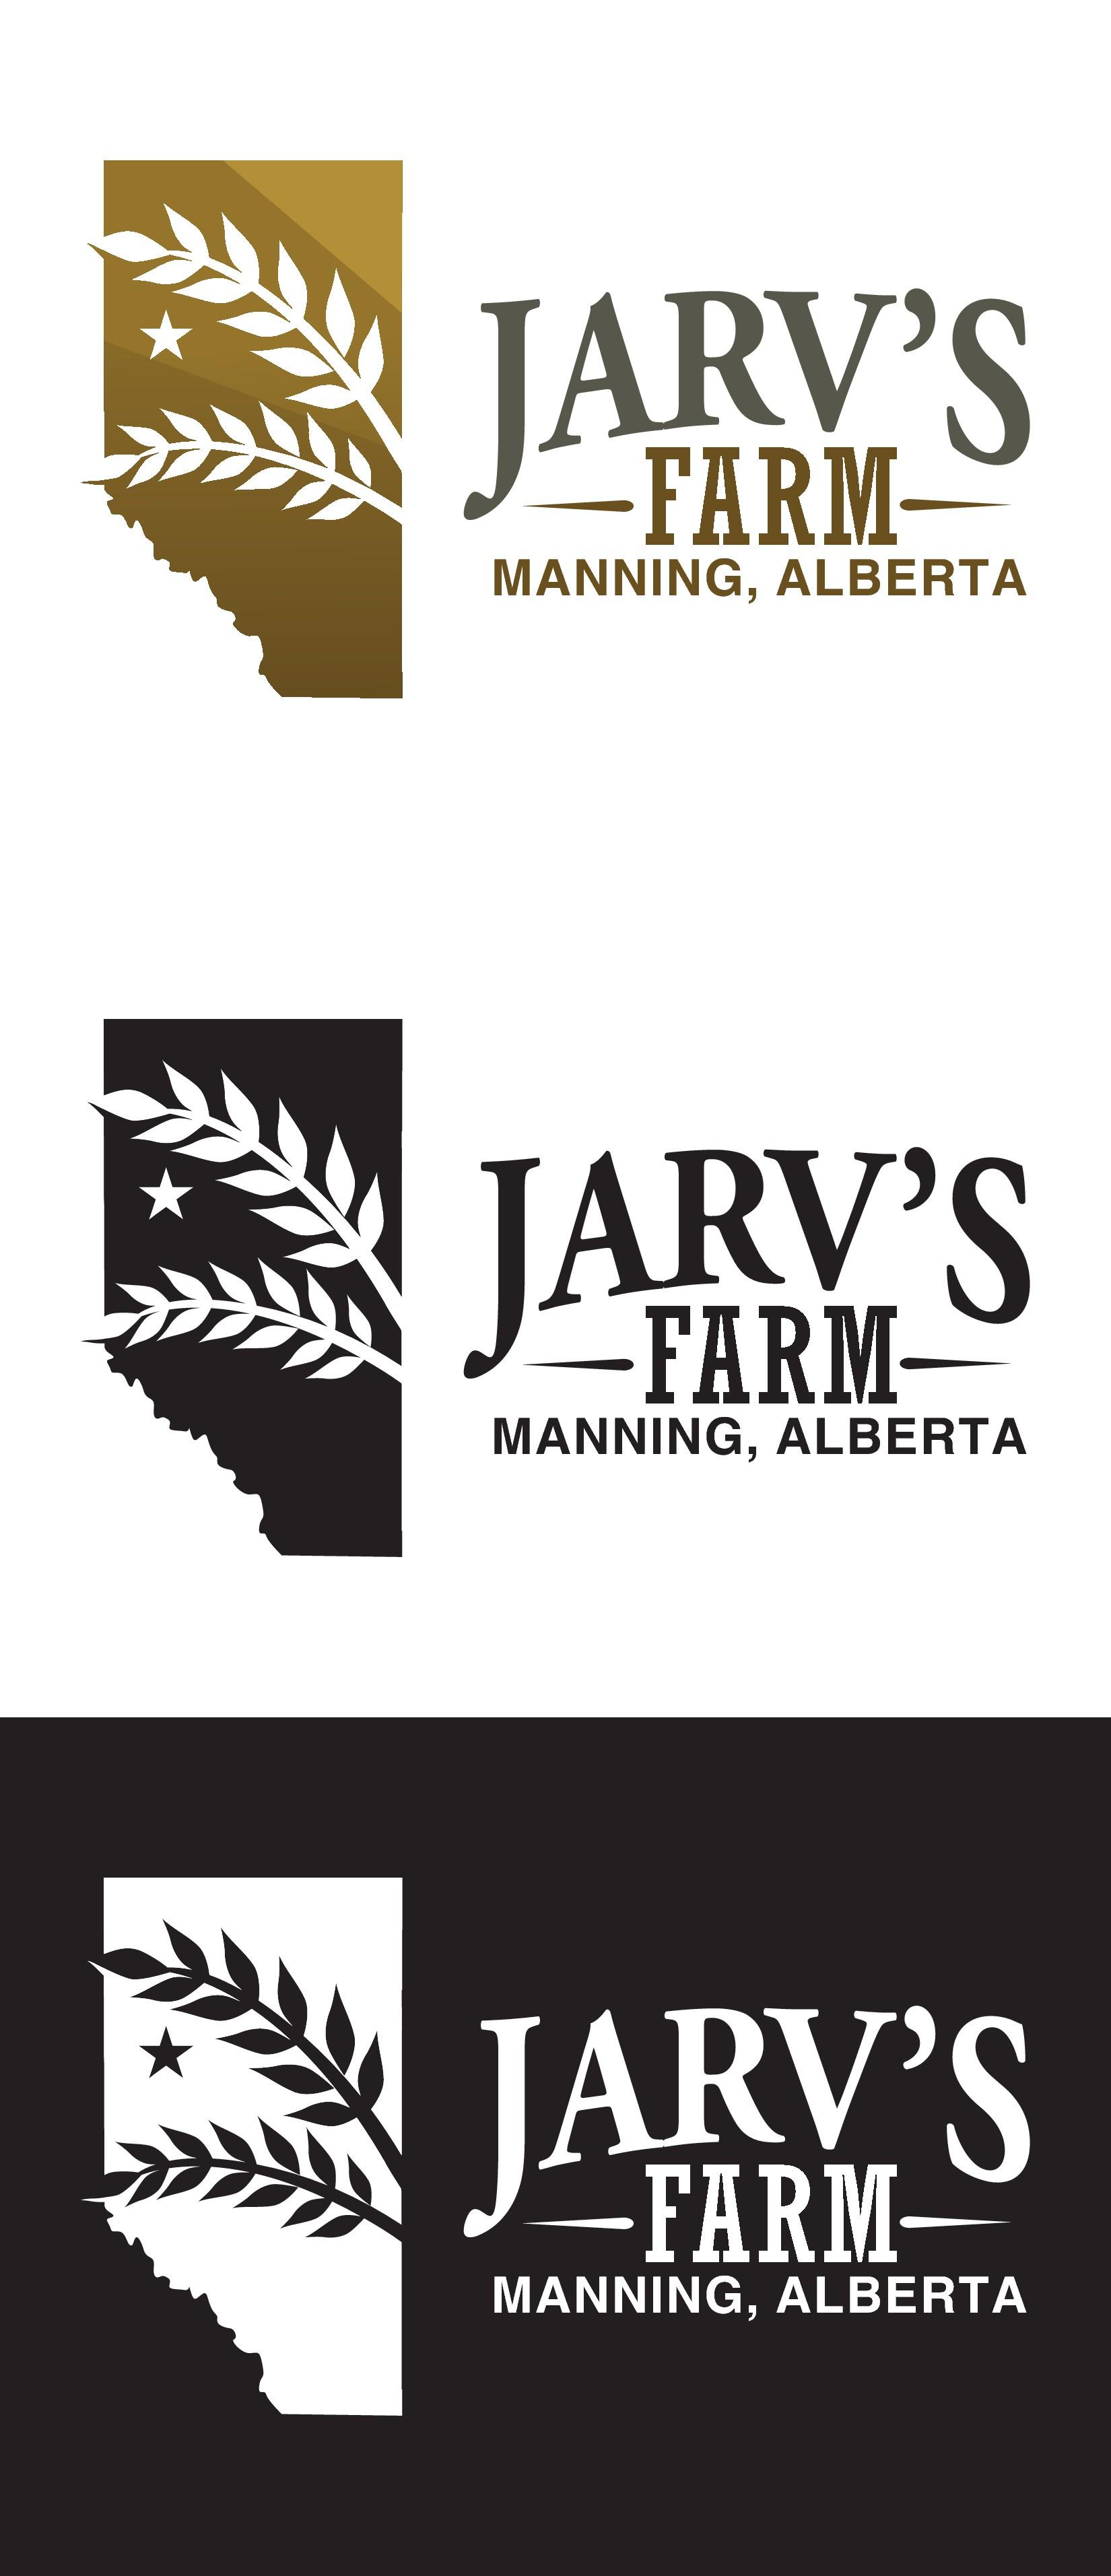 Farm in need of a nice logo.